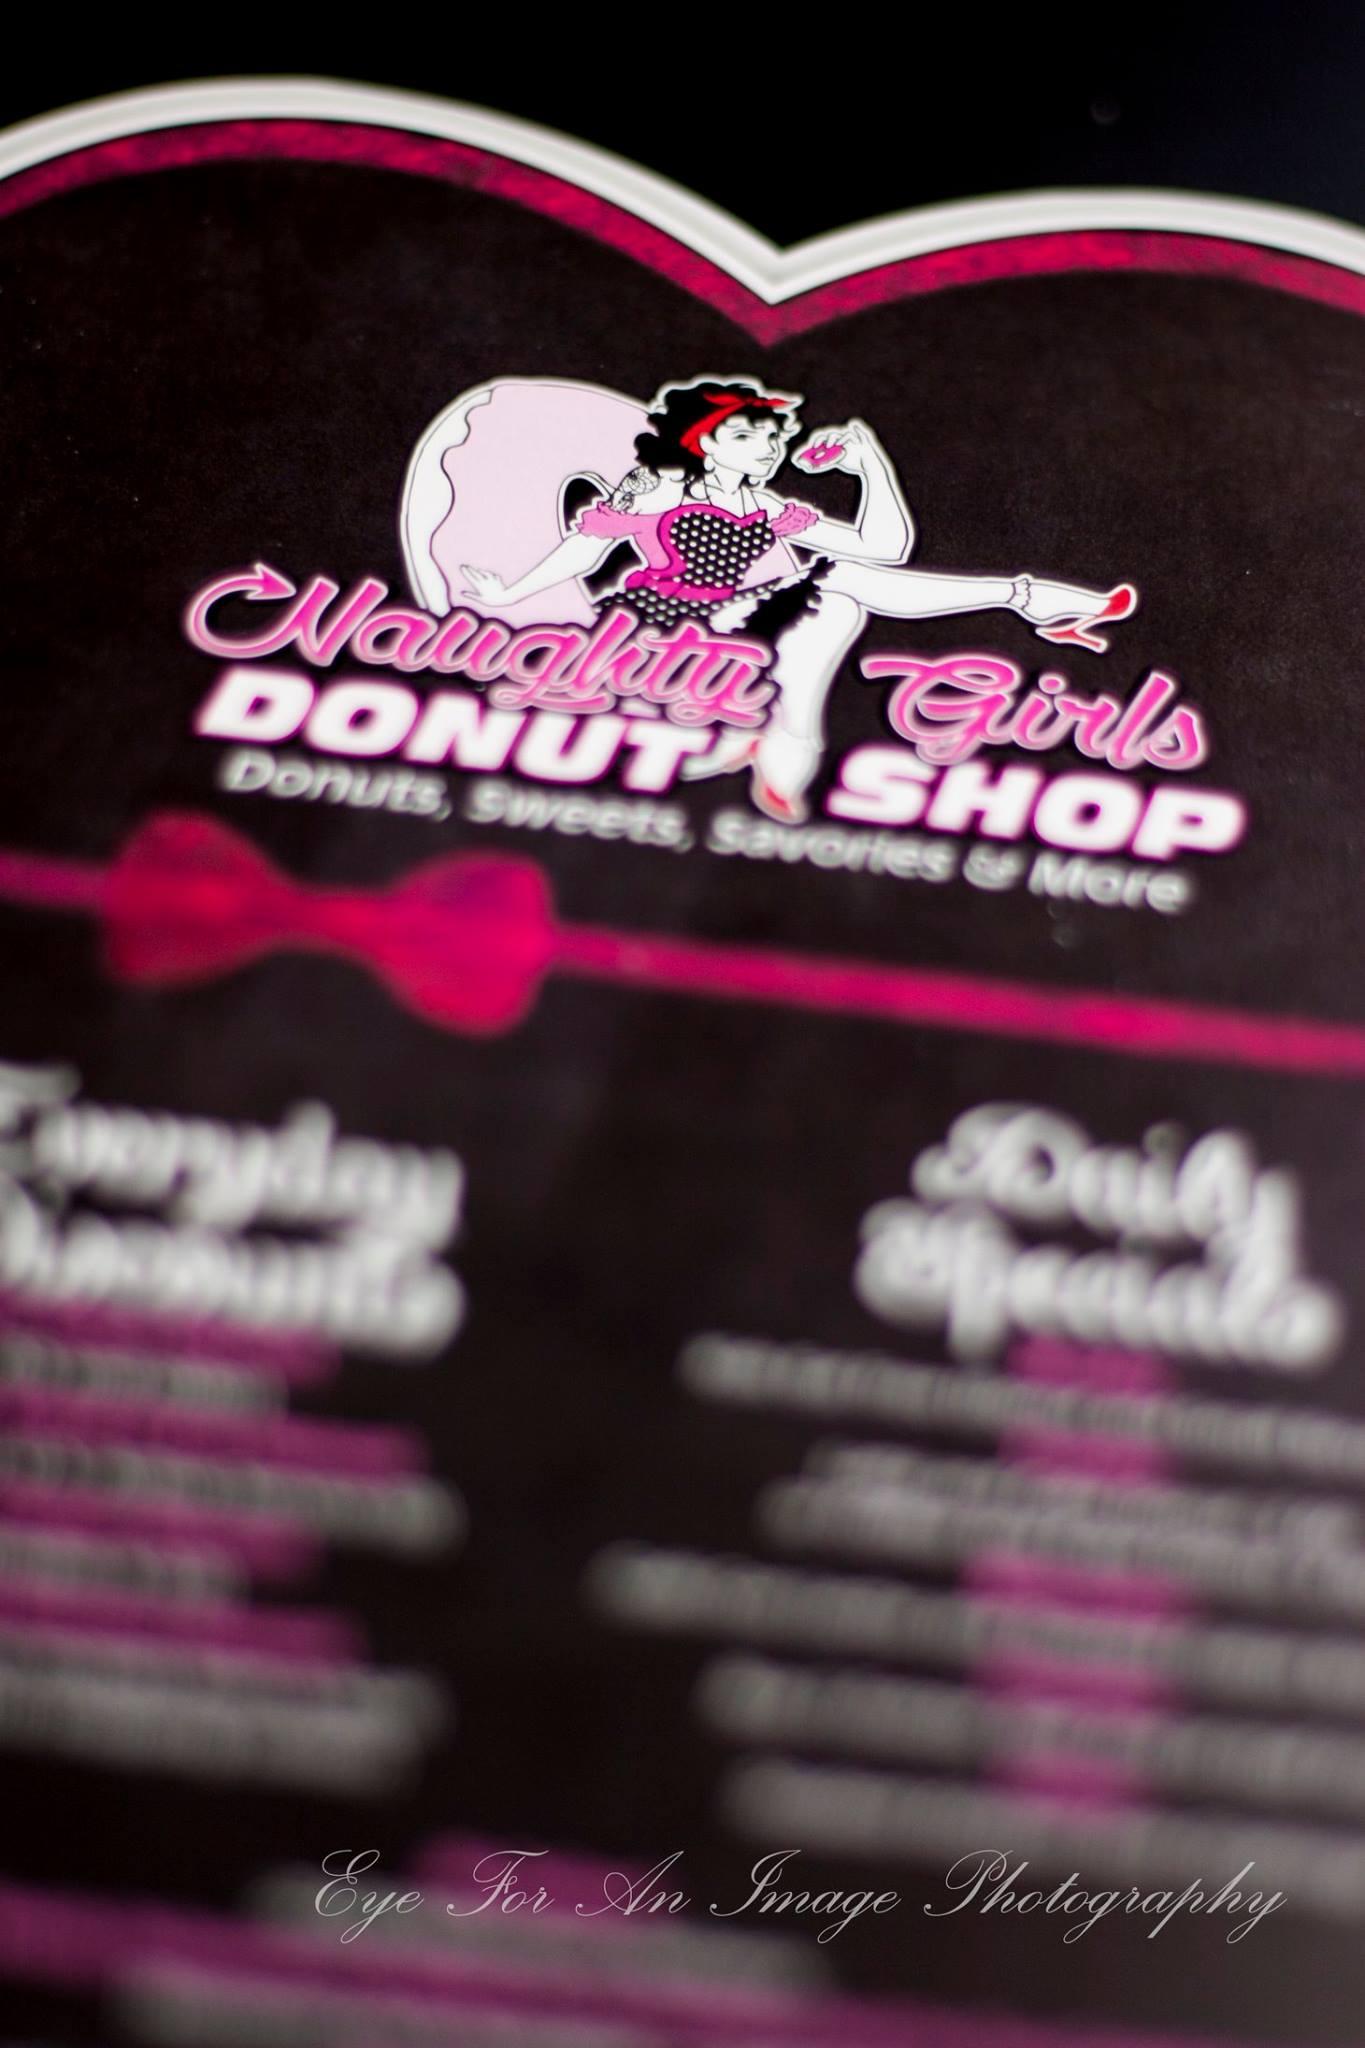 grumpy townsfolk slut shame teenagers donut shop name lord